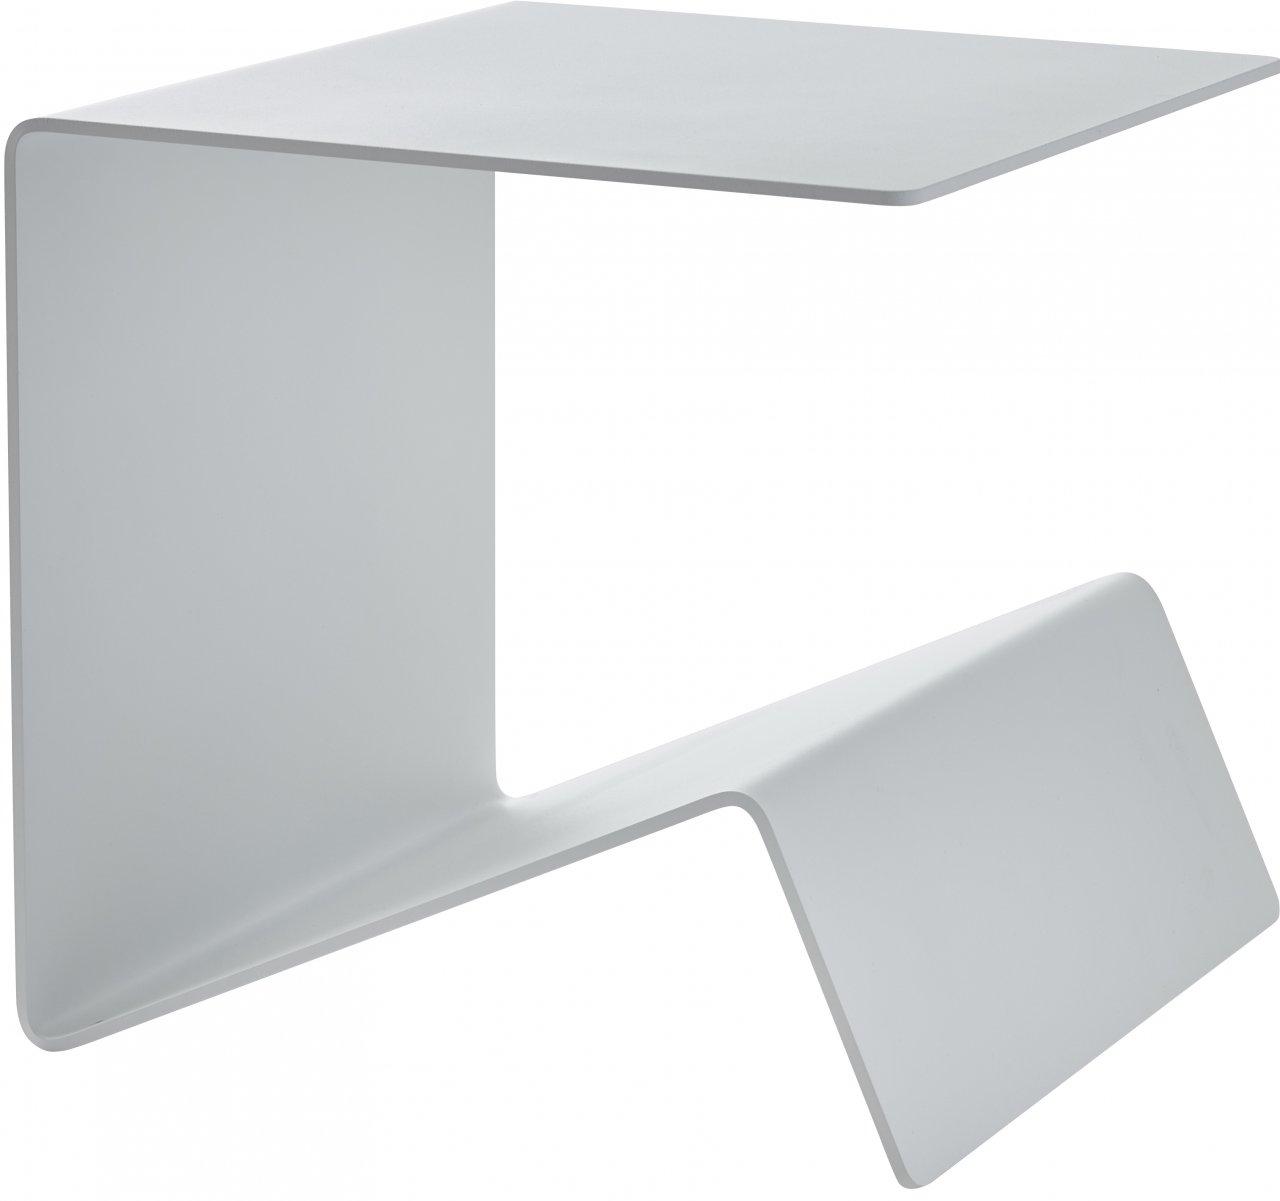 BUK side table